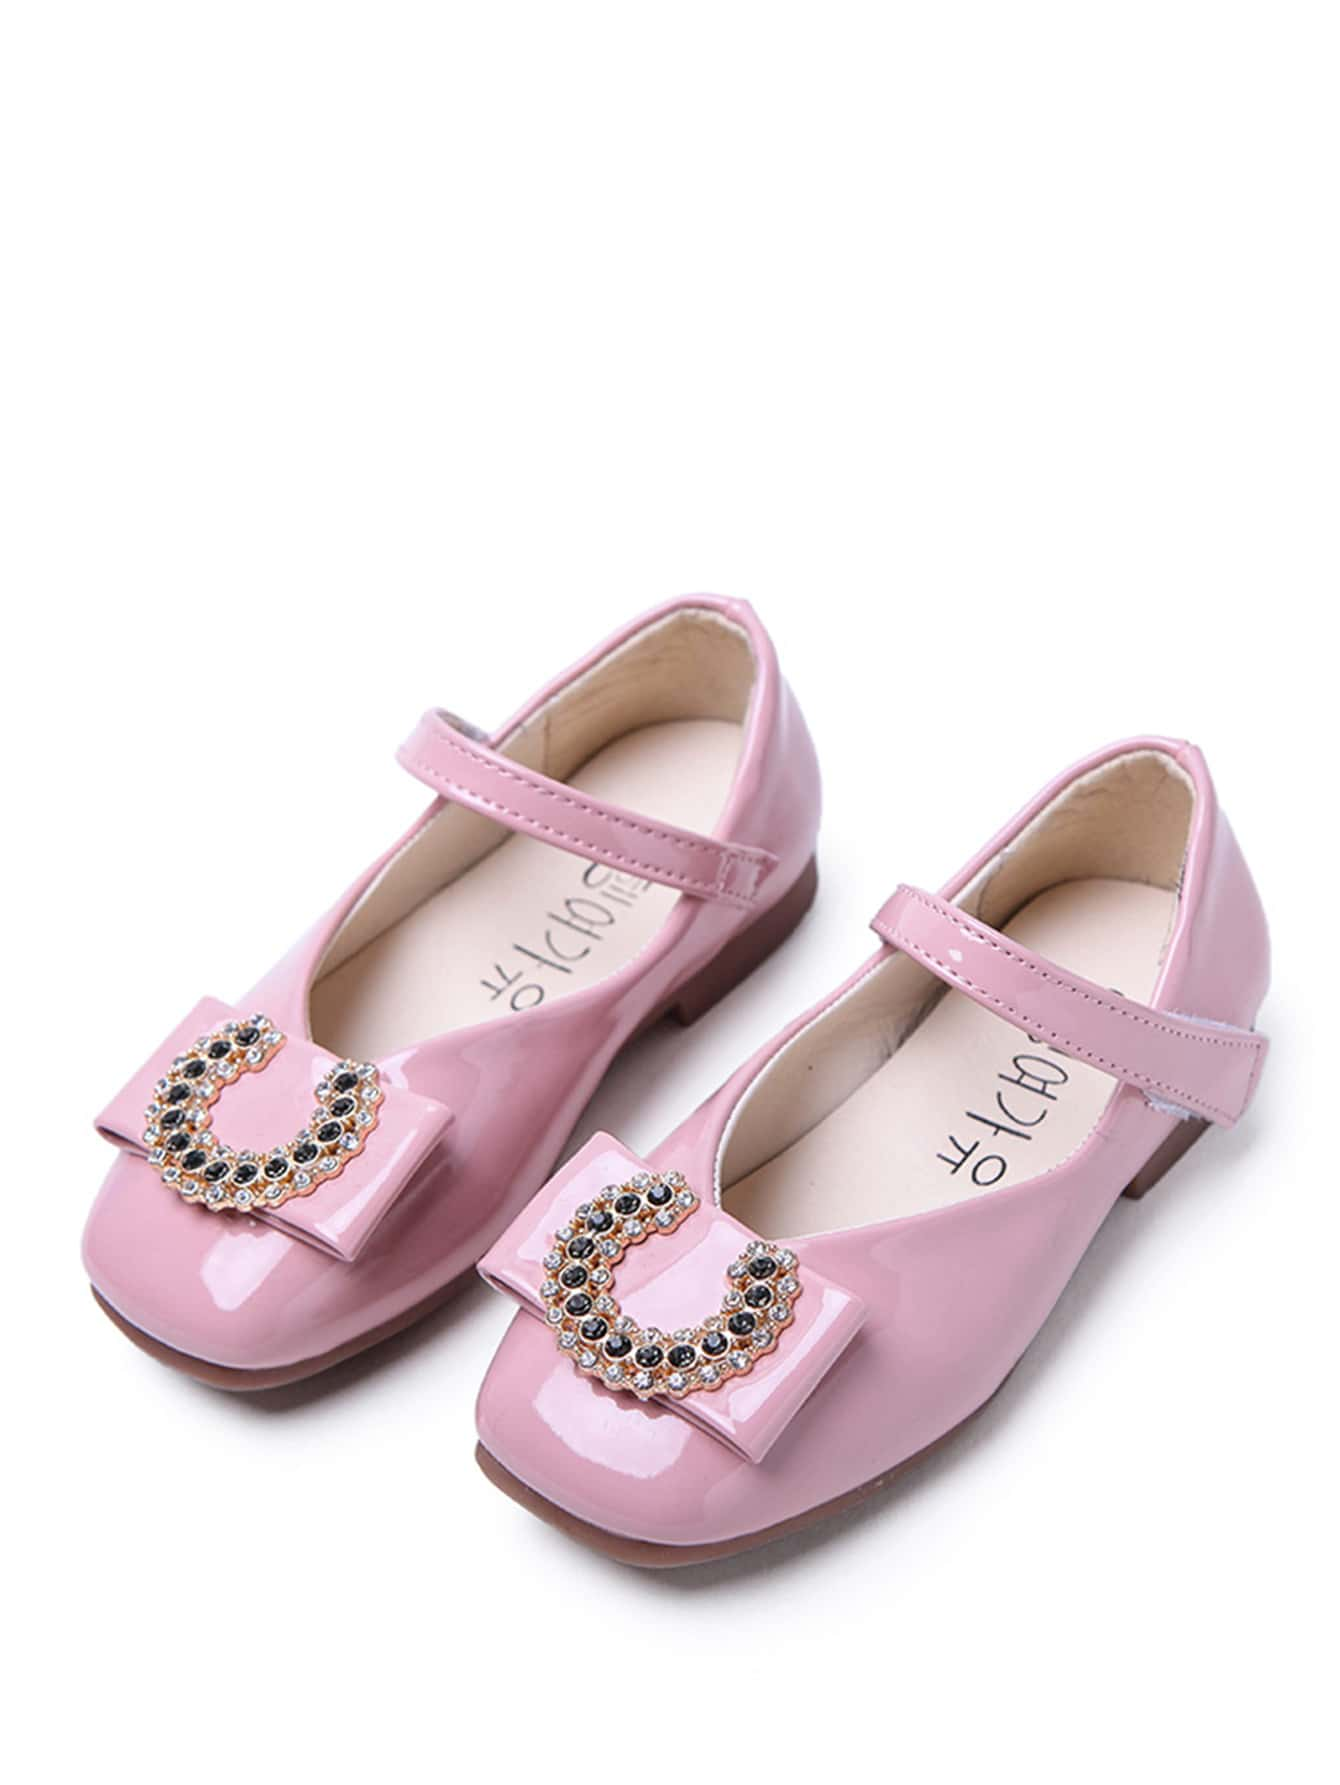 00faf60c6 حذاء مزخرف بحجر الراين للبنات الصغار | شي إن